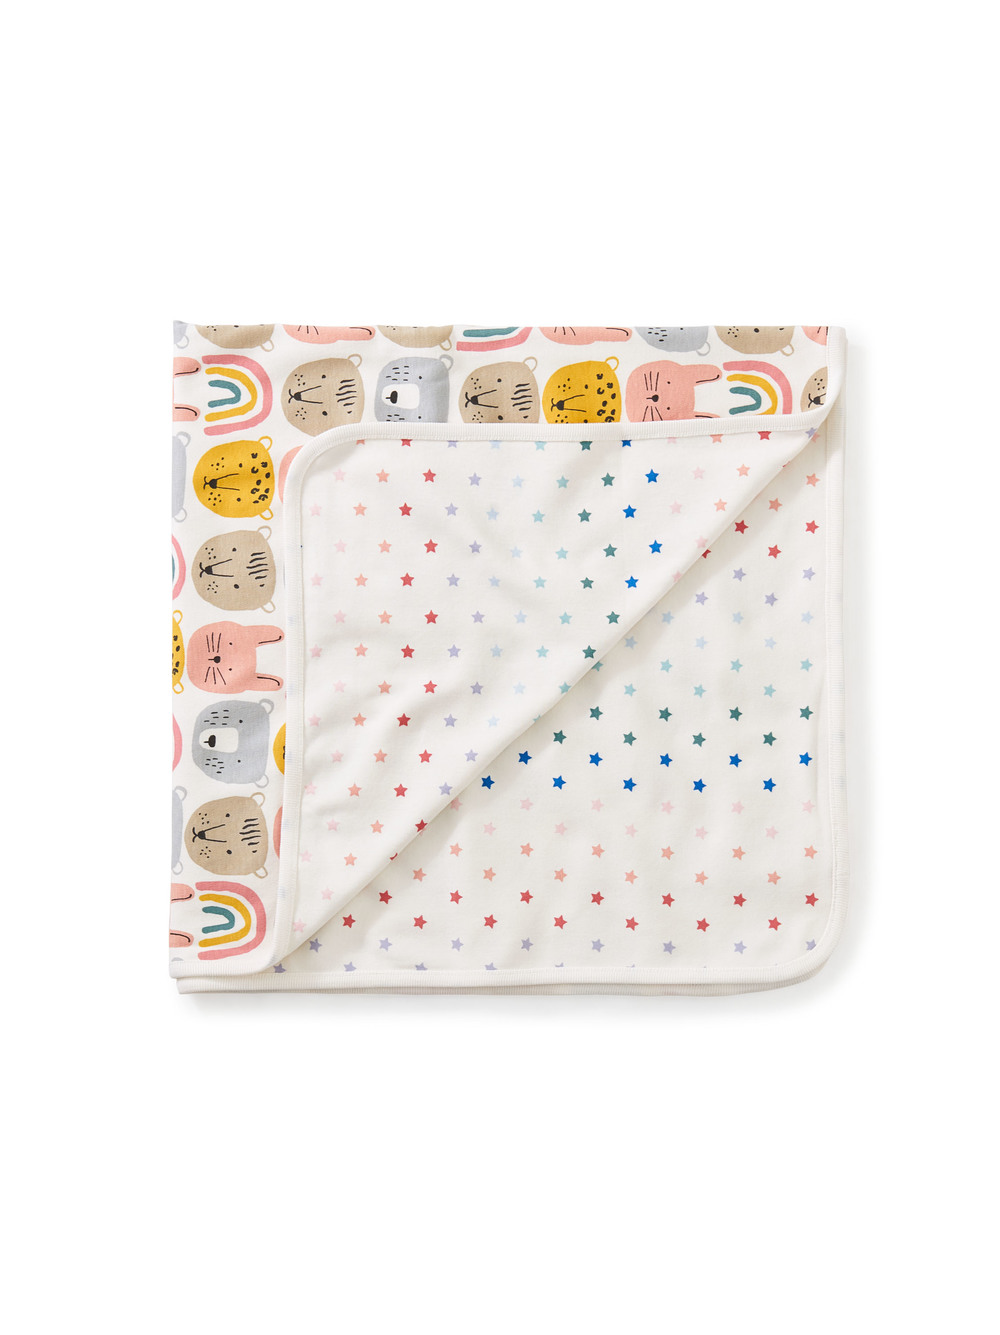 Reversible Baby Blanket